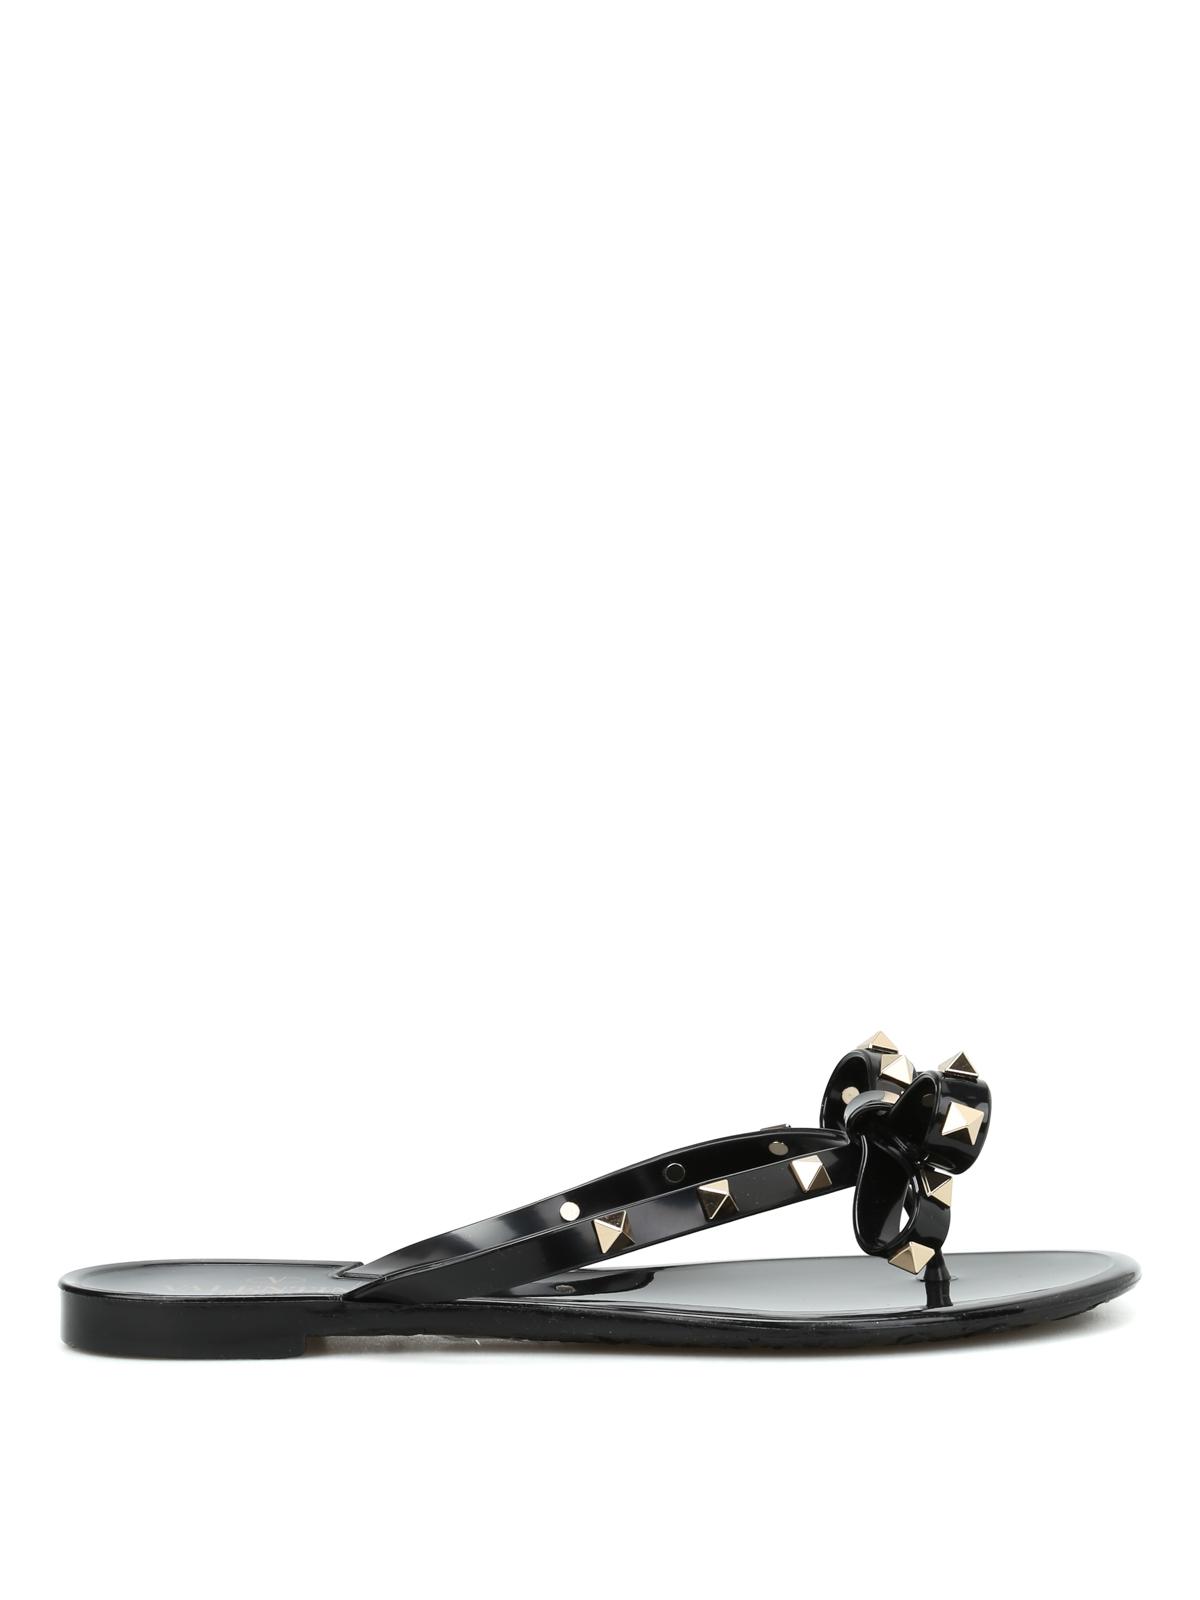 a28f66a81573 Valentino Garavani - Rockstud PVC thong sandals - sandals ...